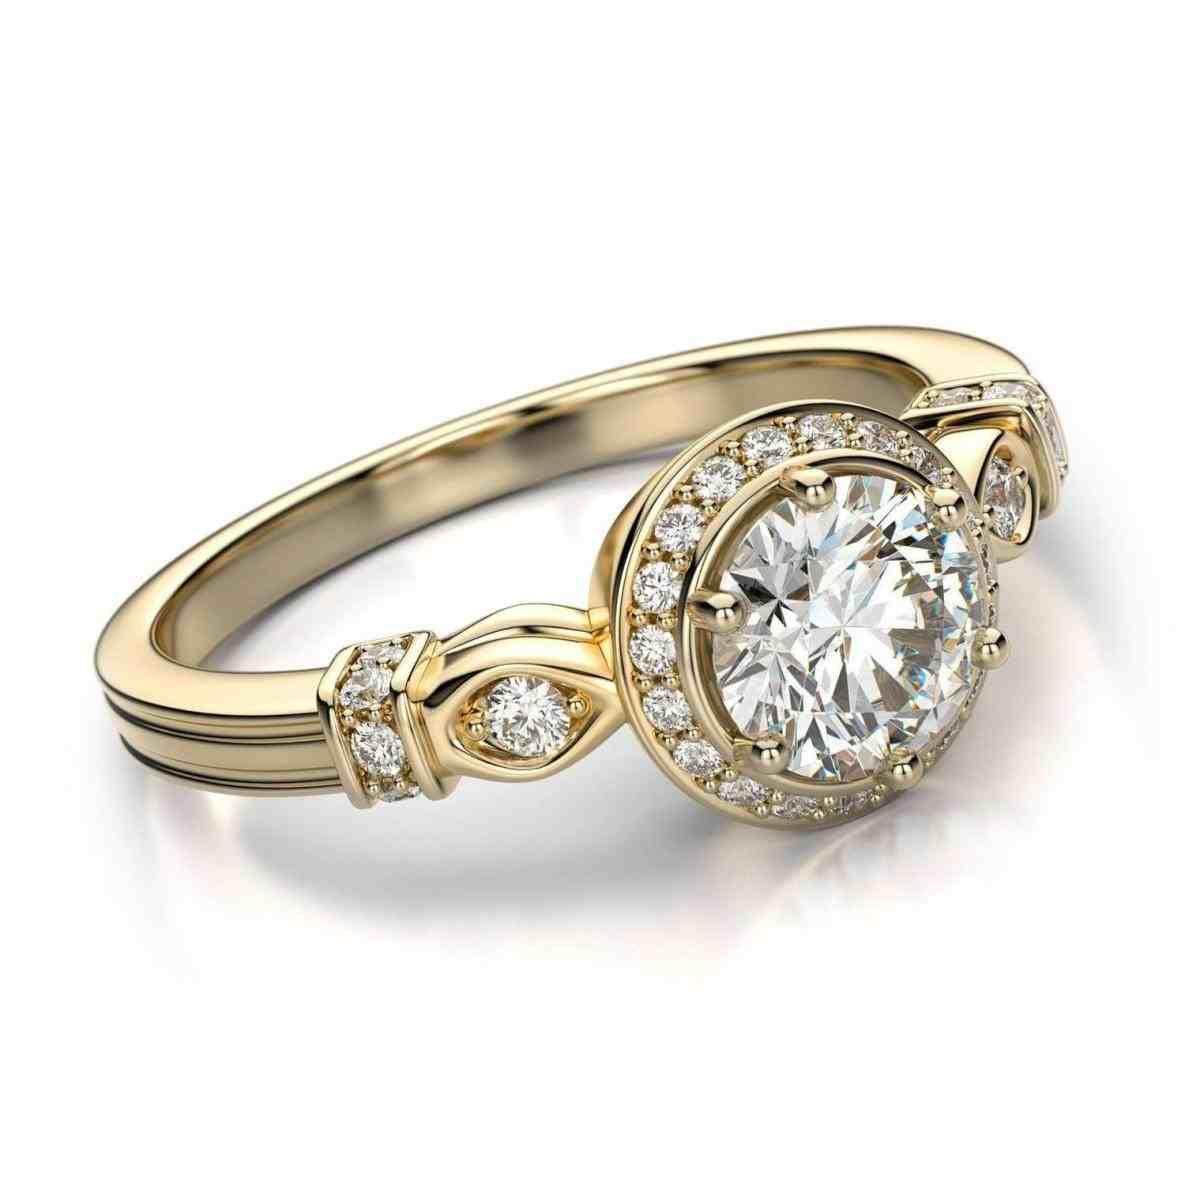 Top new post vintage style wedding ring visit wedbridalte